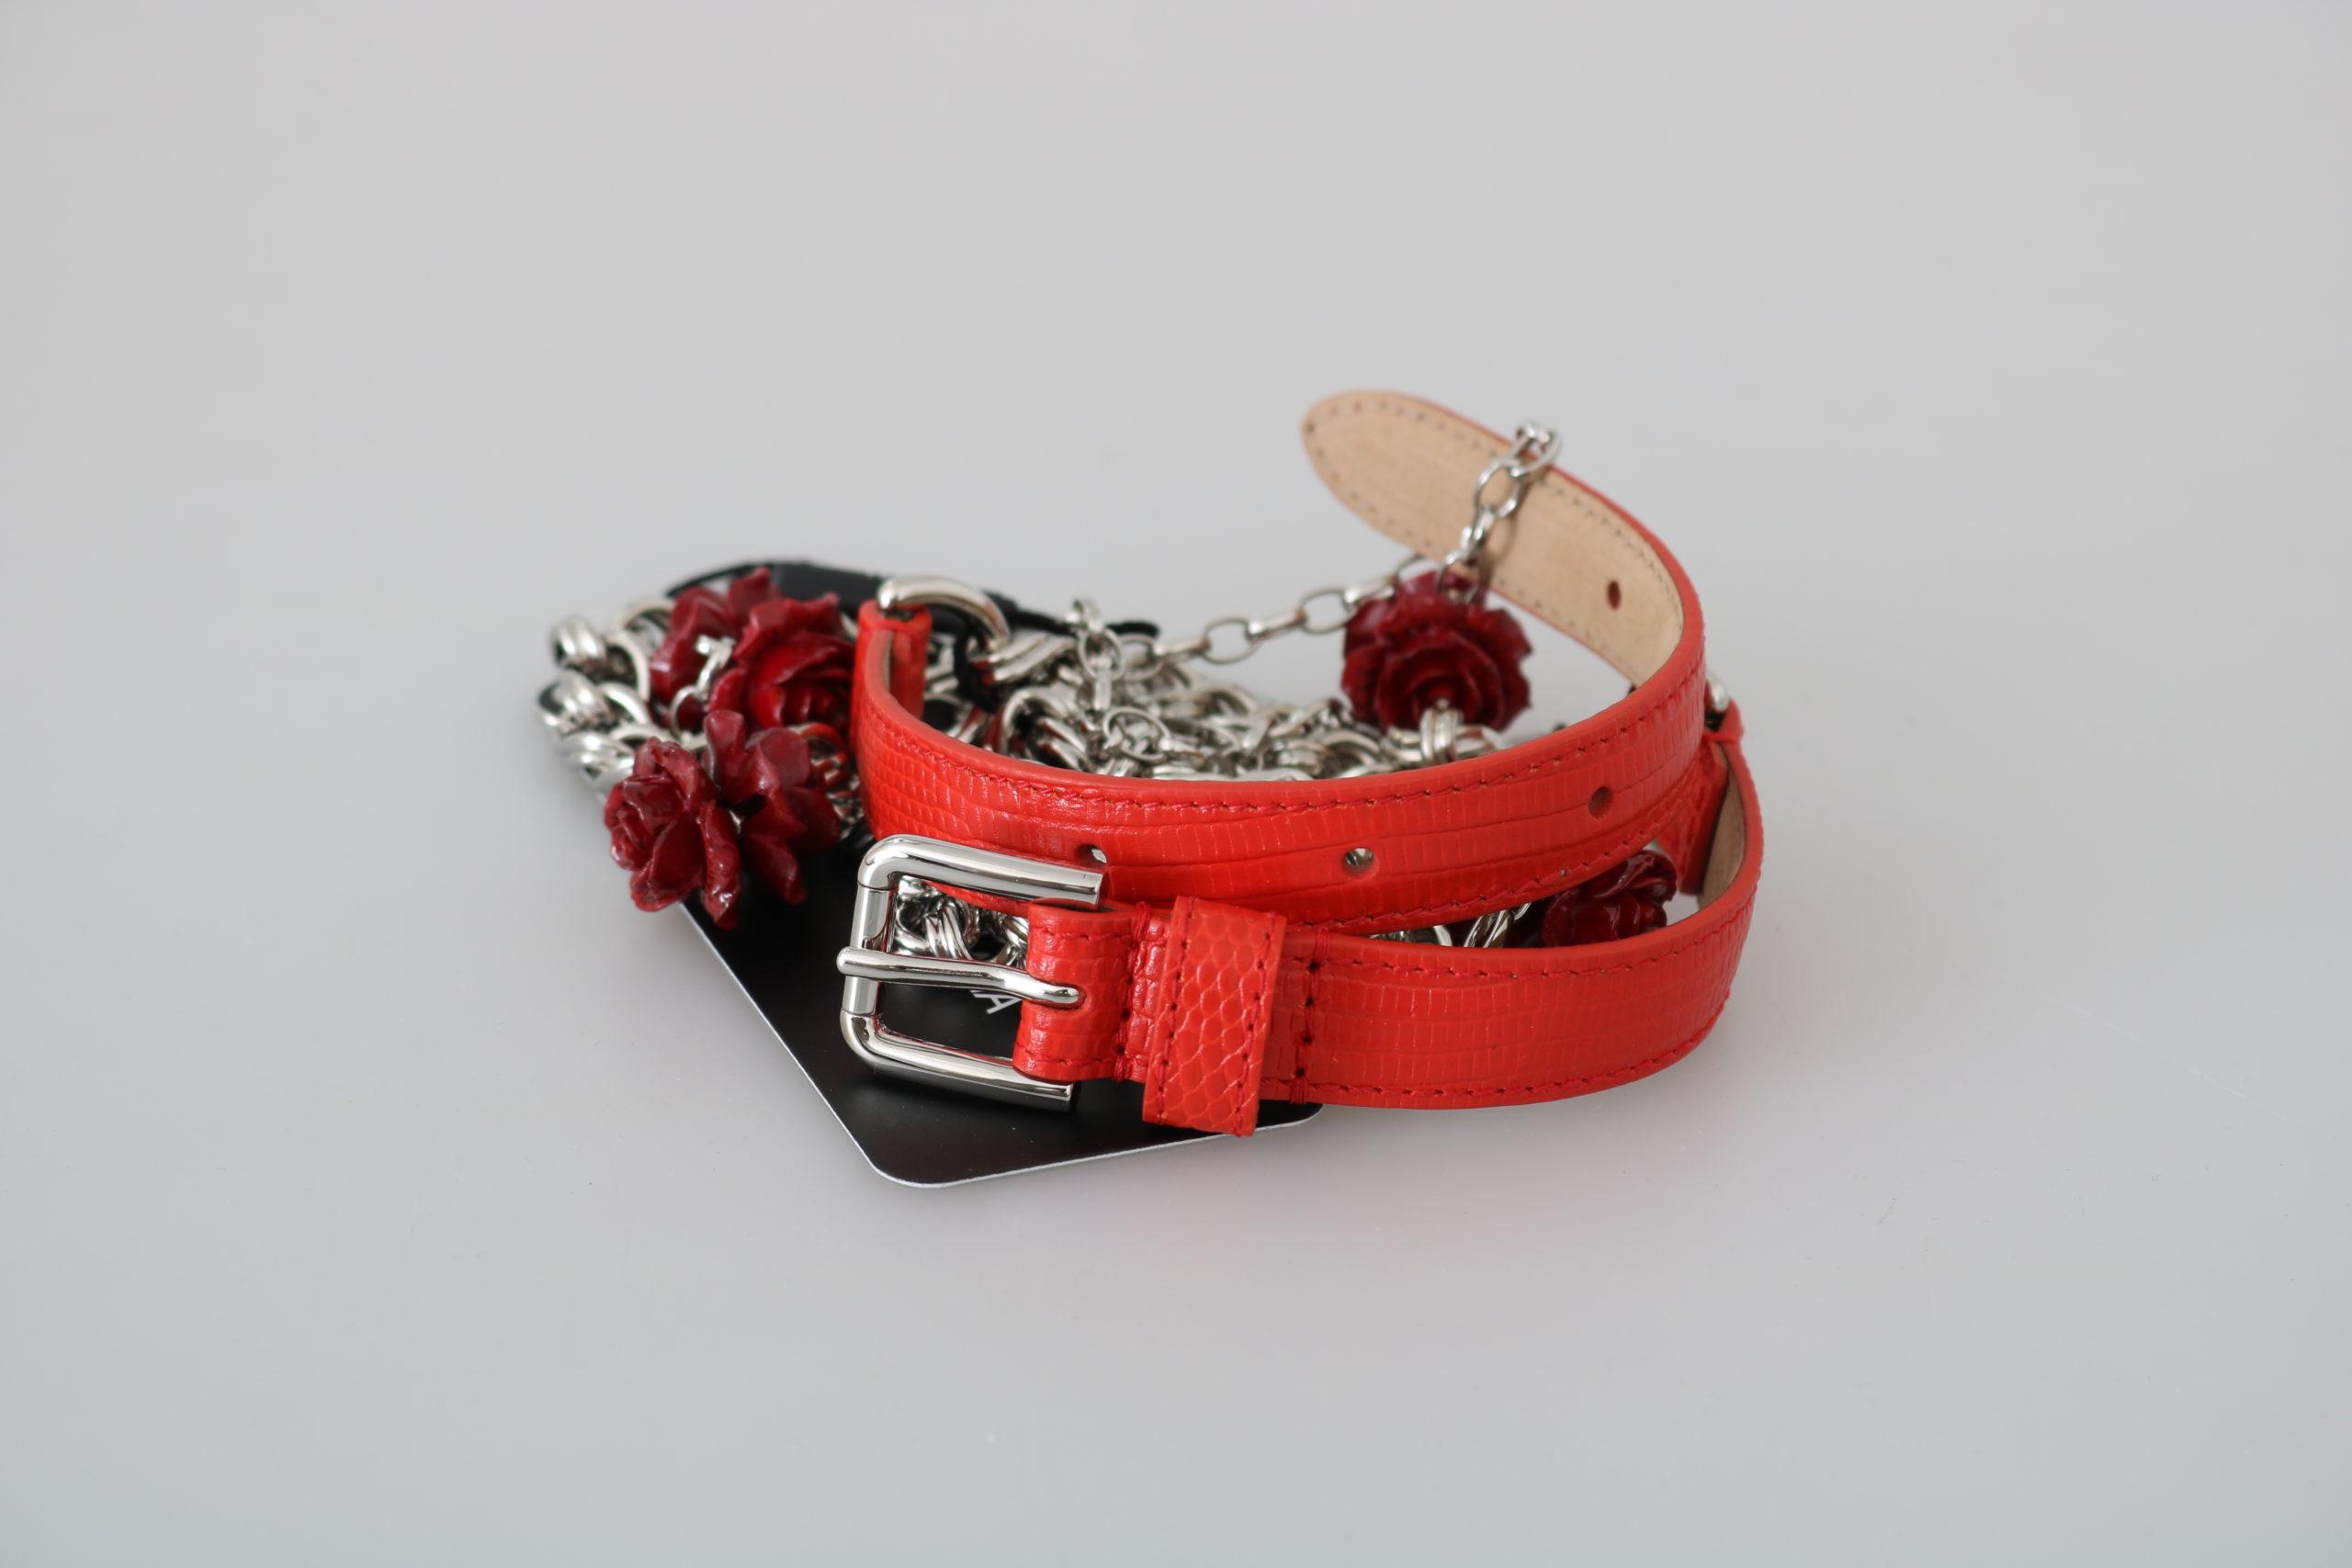 Dolce & Gabbana Women's Chain Flower Roses Belt Orange BEL60424 - 75 cm / 30 Inches